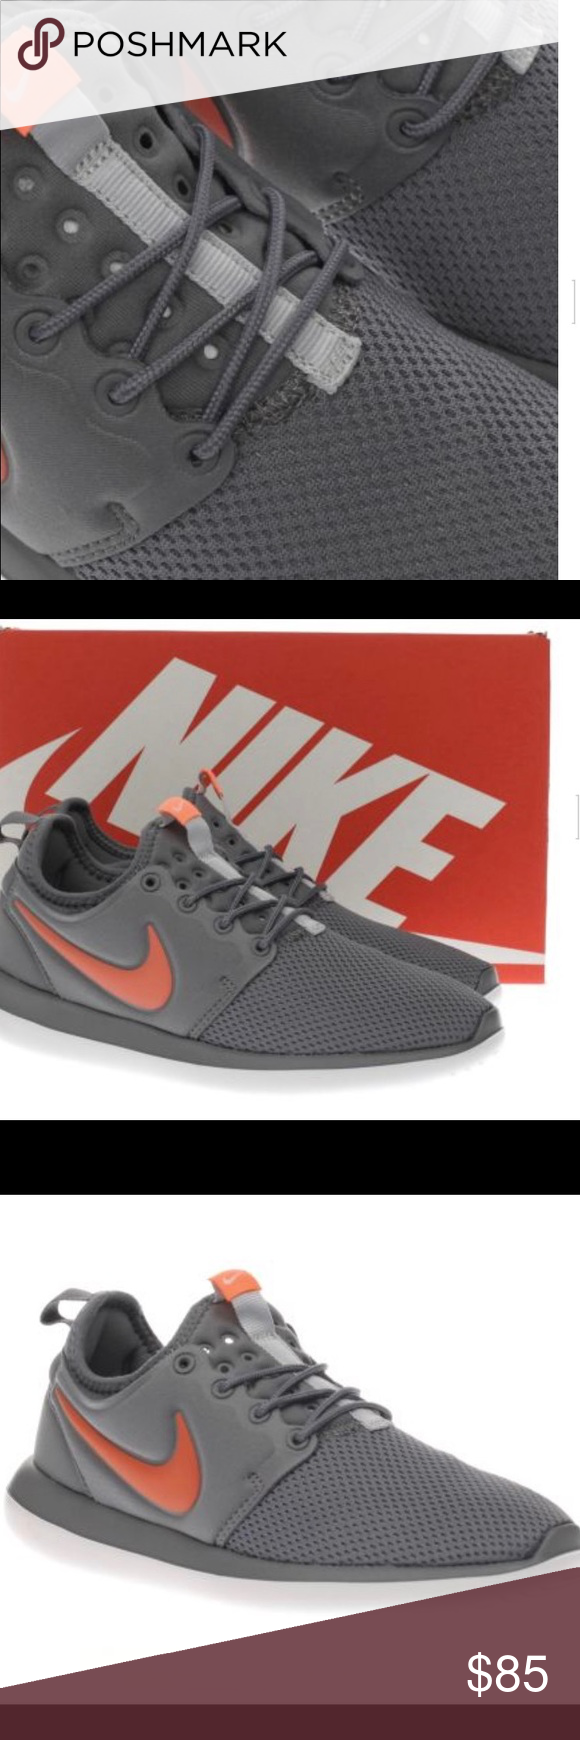 07d66812ccda Nike Roshe two